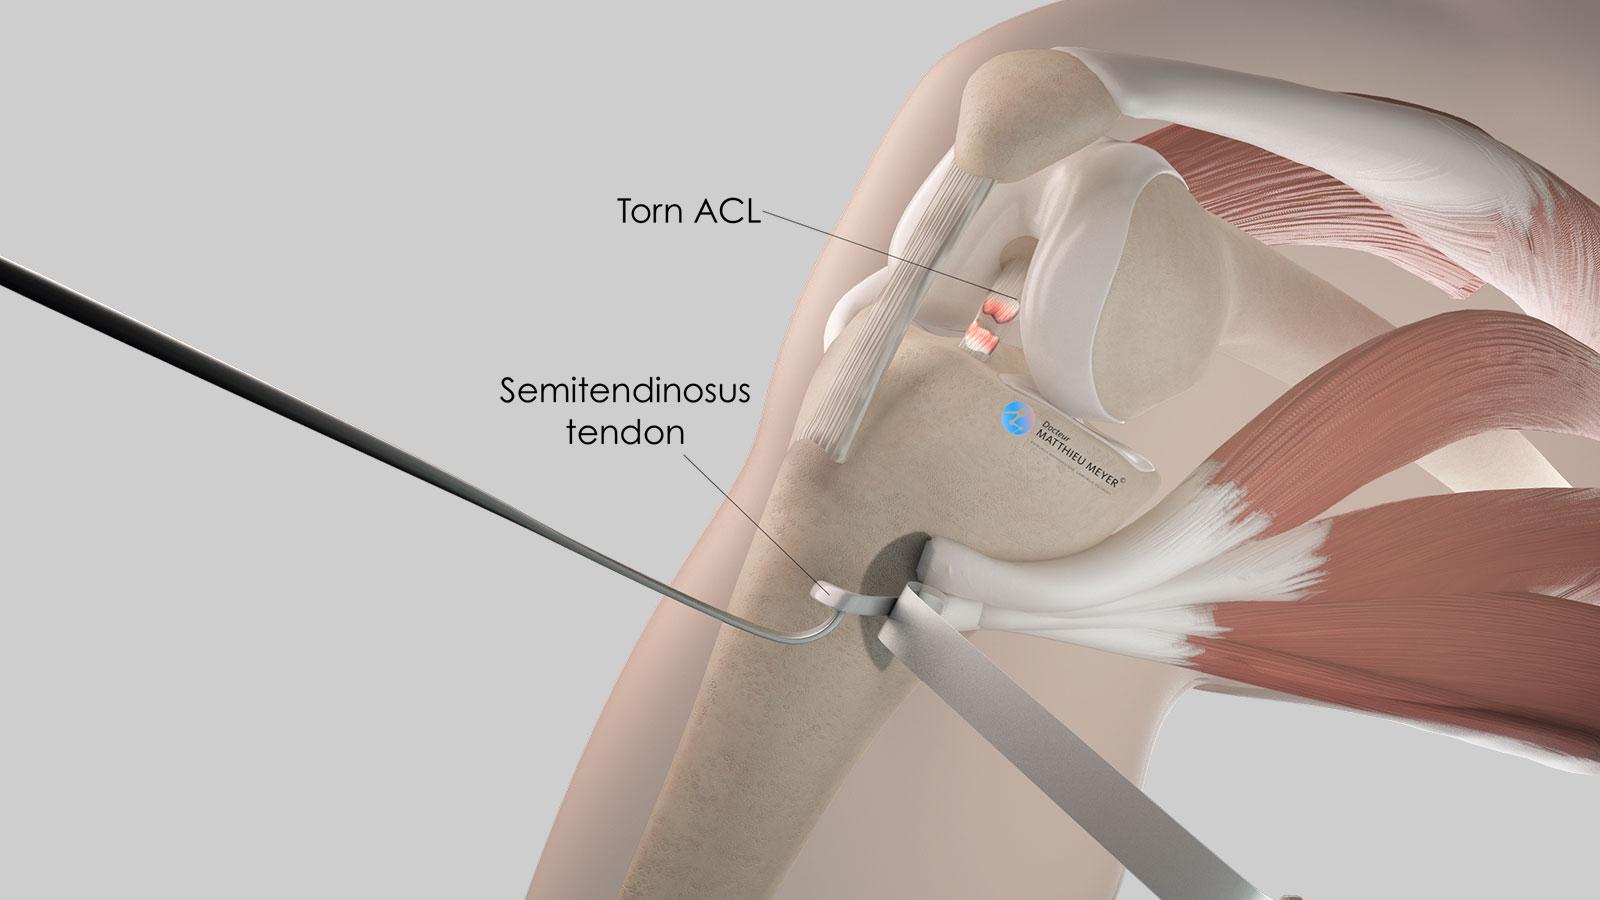 Release of the semitendinosus tendon